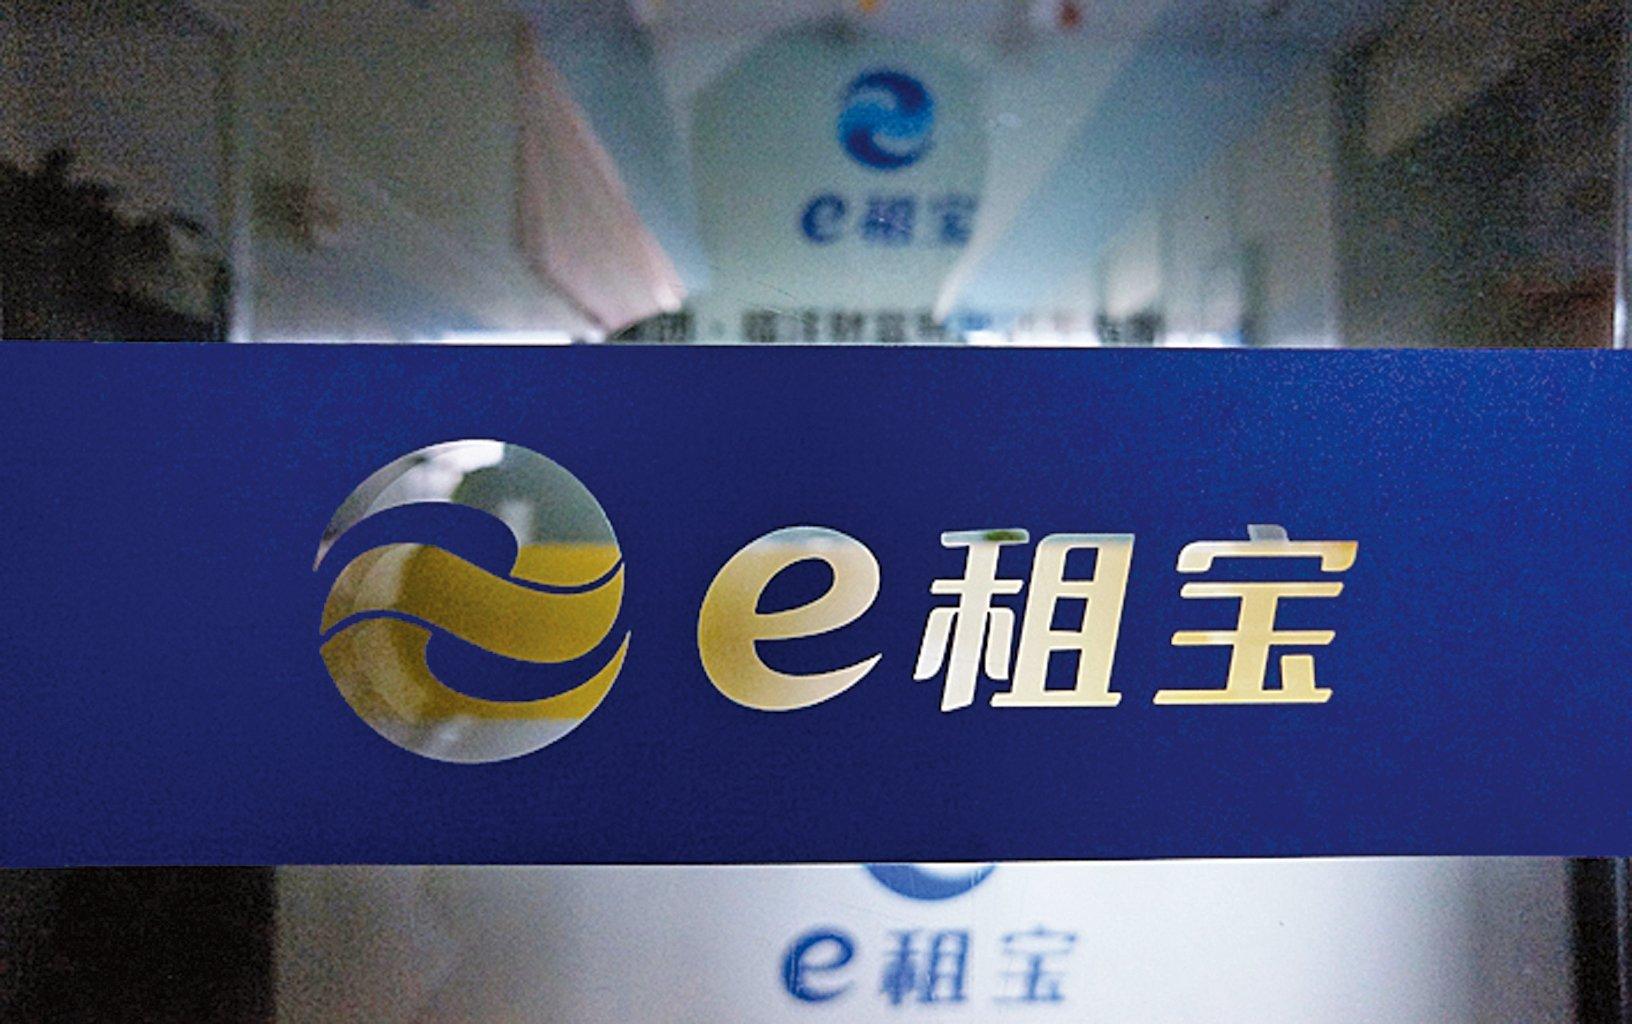 E租寶曾經是中國最大的P2P借貸平台,今年爆出是龐氏騙局。它在不到兩年時間裏從90萬名散戶投資者那裏募集了500億元。(Getty Images)